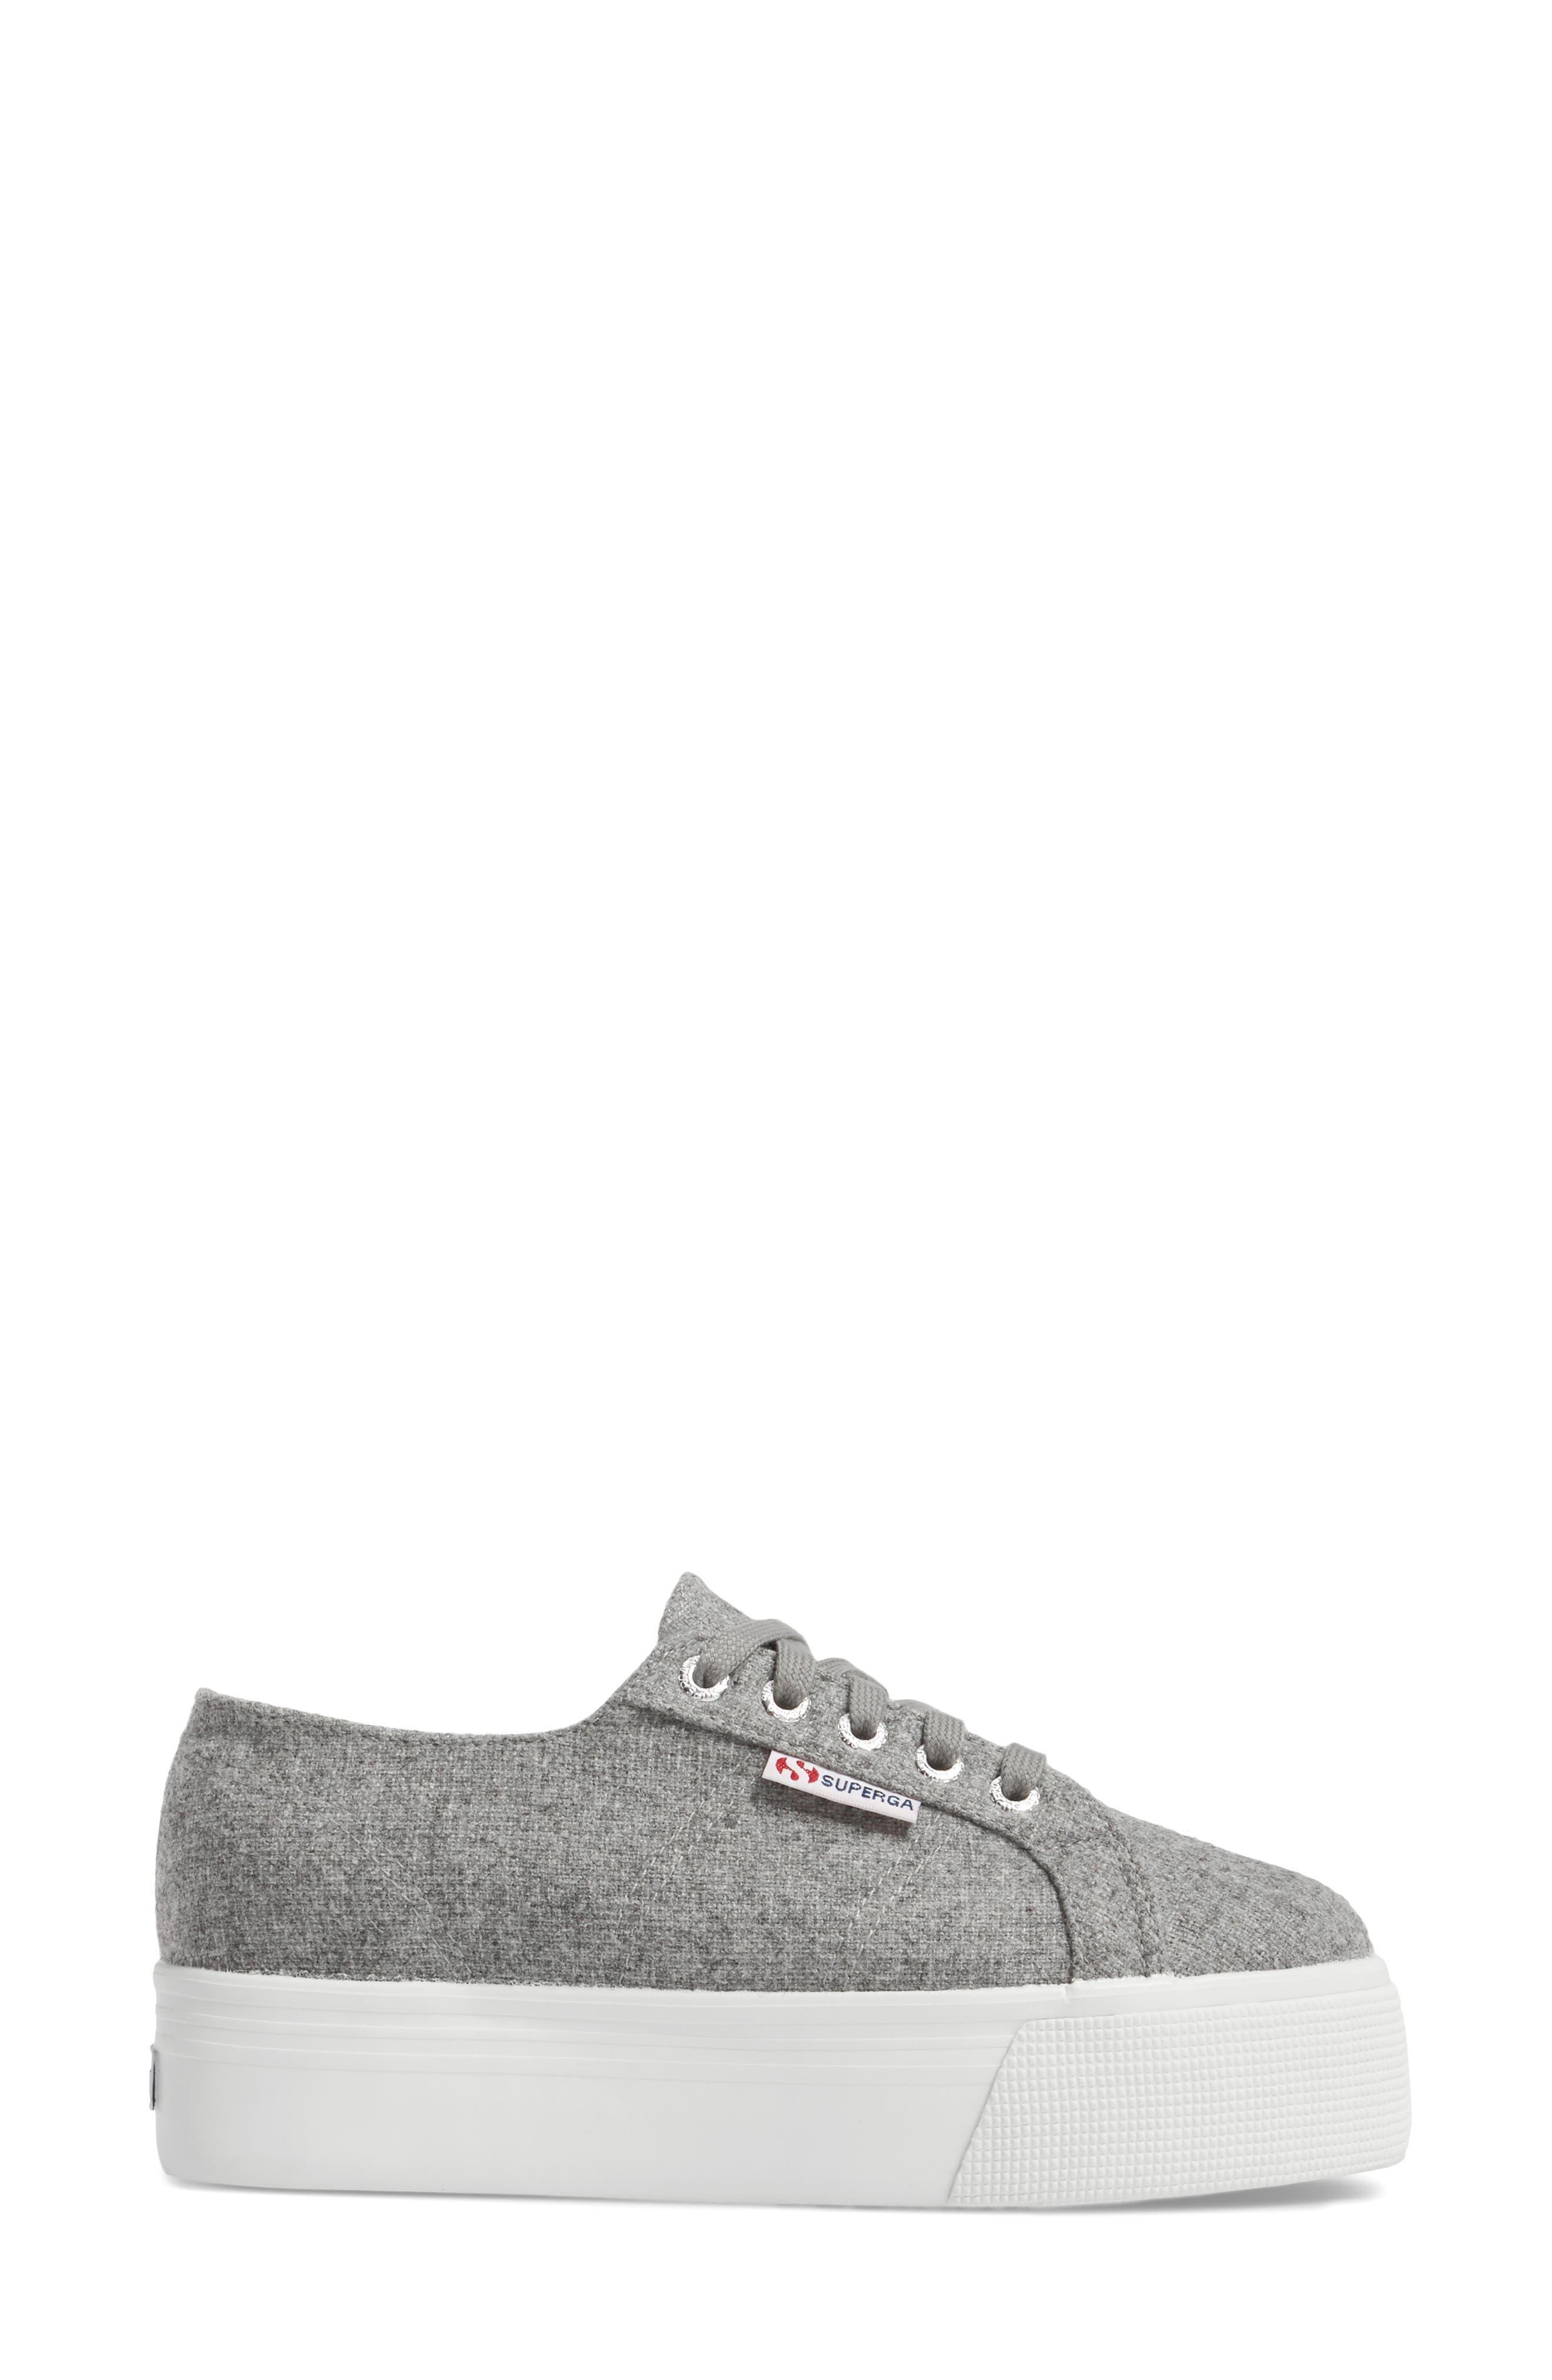 2790 Platform Sneaker,                             Alternate thumbnail 3, color,                             Light Grey Canvas